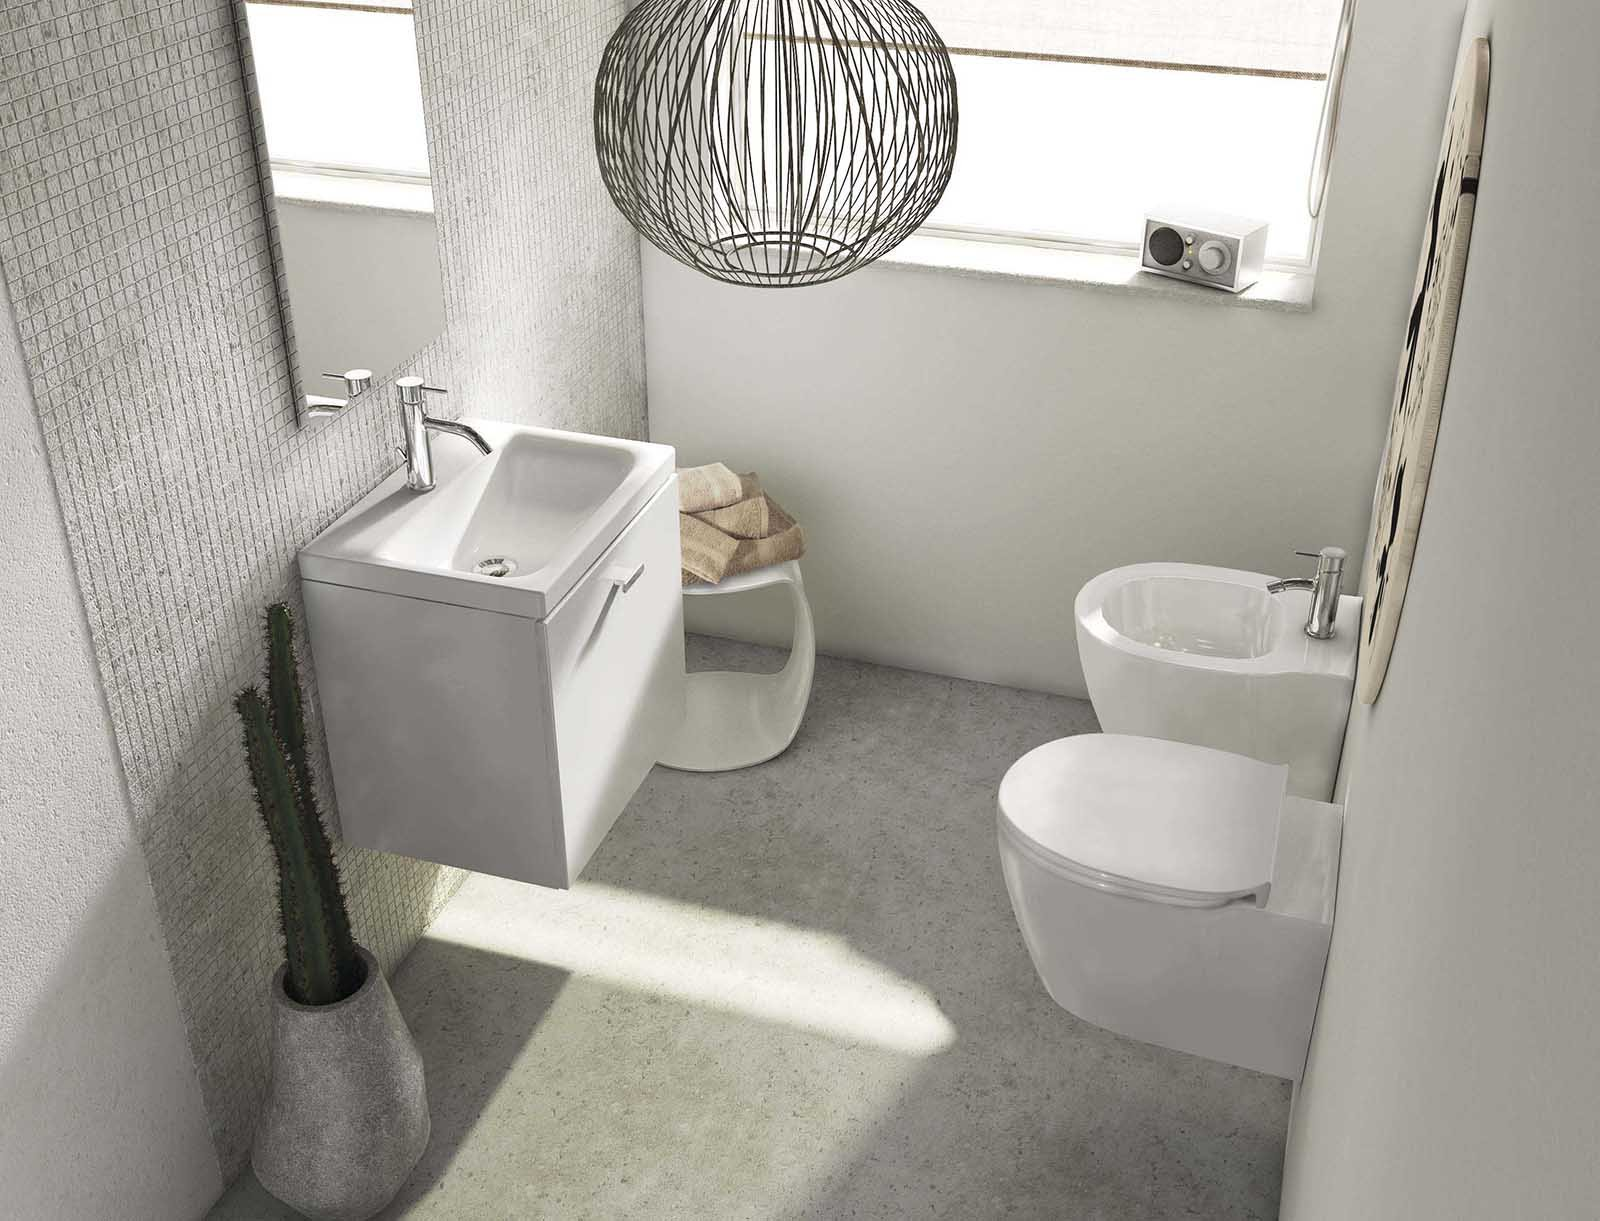 arredo bagno mobili senza lavabo | sweetwaterrescue - Arredo Bagno Mobili Senza Lavabo